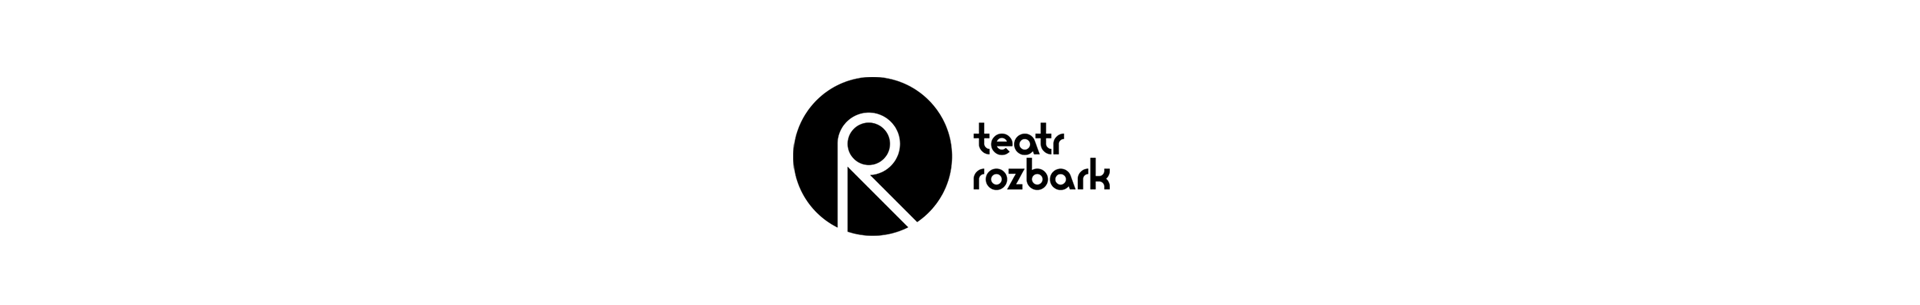 Rozbark-logo-4